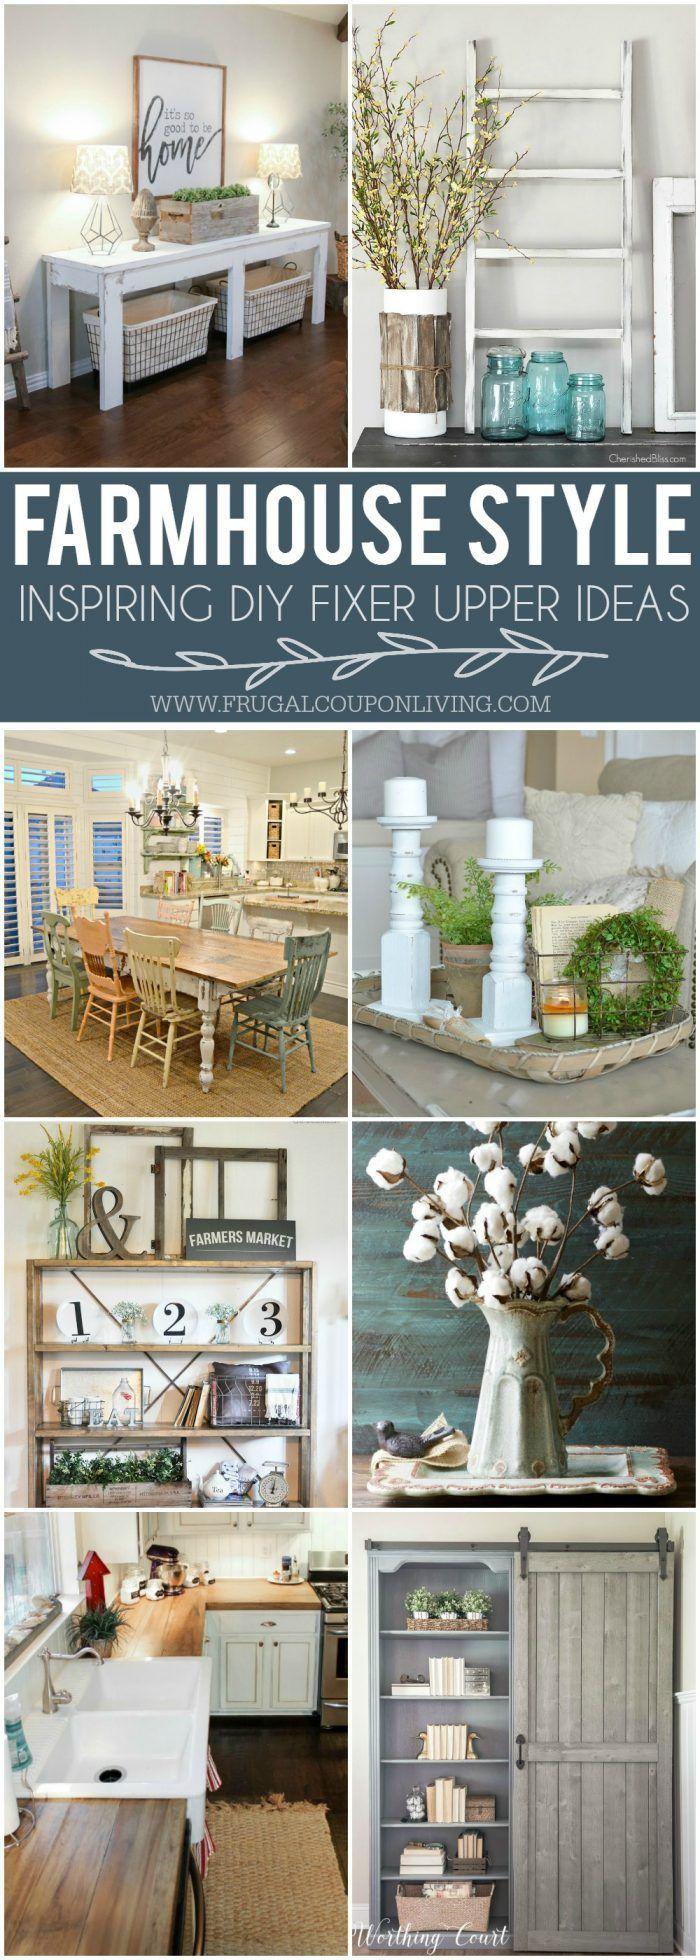 Joanna gaines hallway decor  DIY Fixer Upper Farmhouse Style Ideas  Fixer upper living room